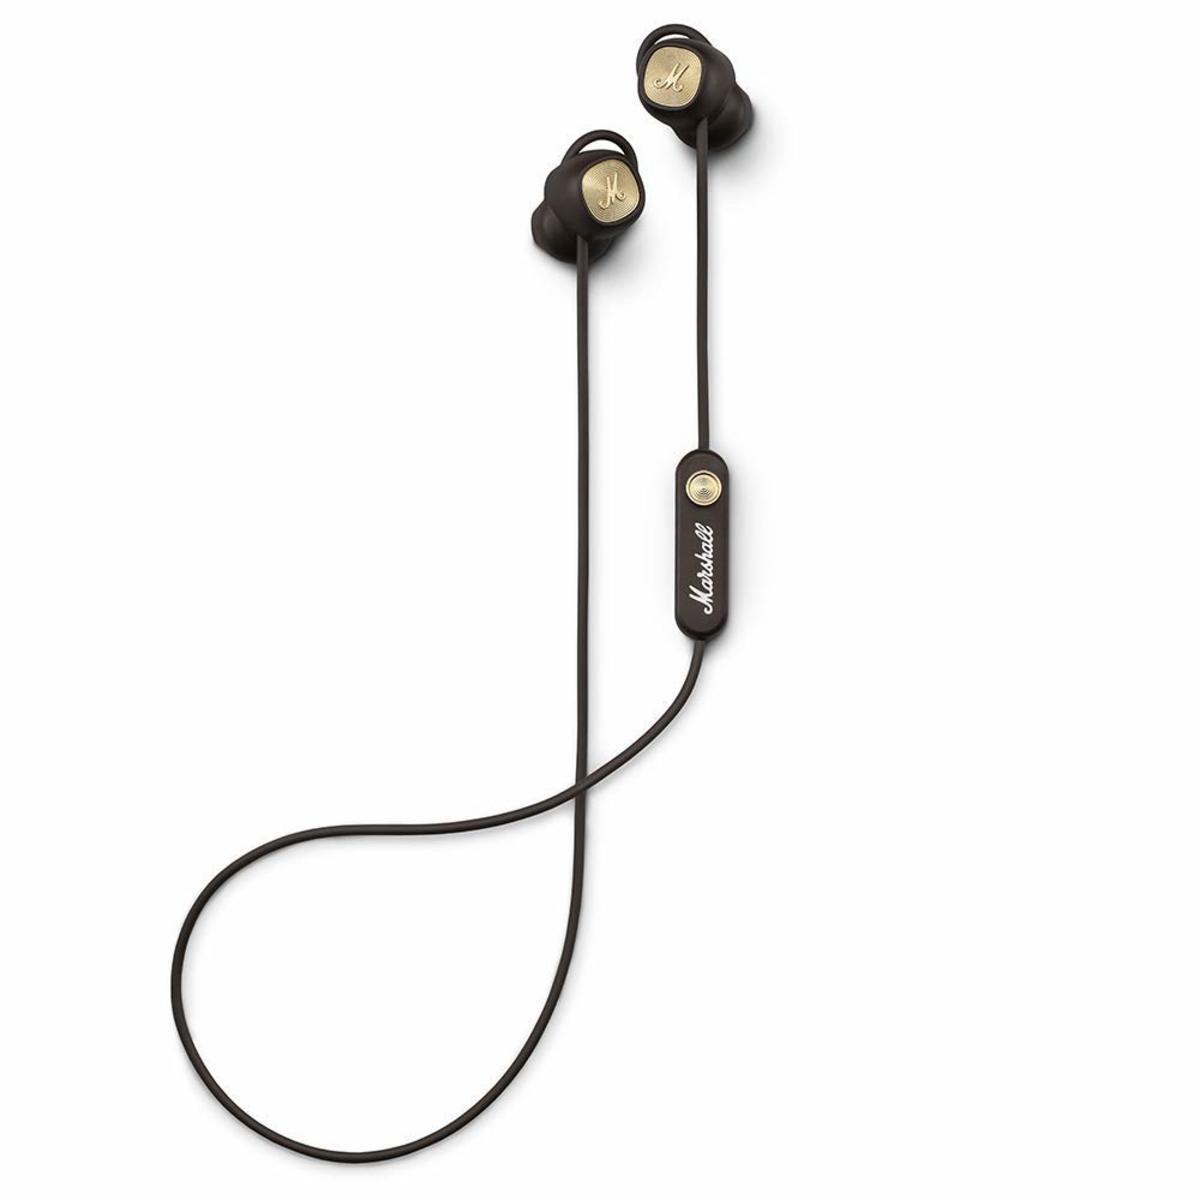 Minor 2 藍牙5.0 APTX無線 14.2 mm dynamic drivers 入耳式耳機棕色